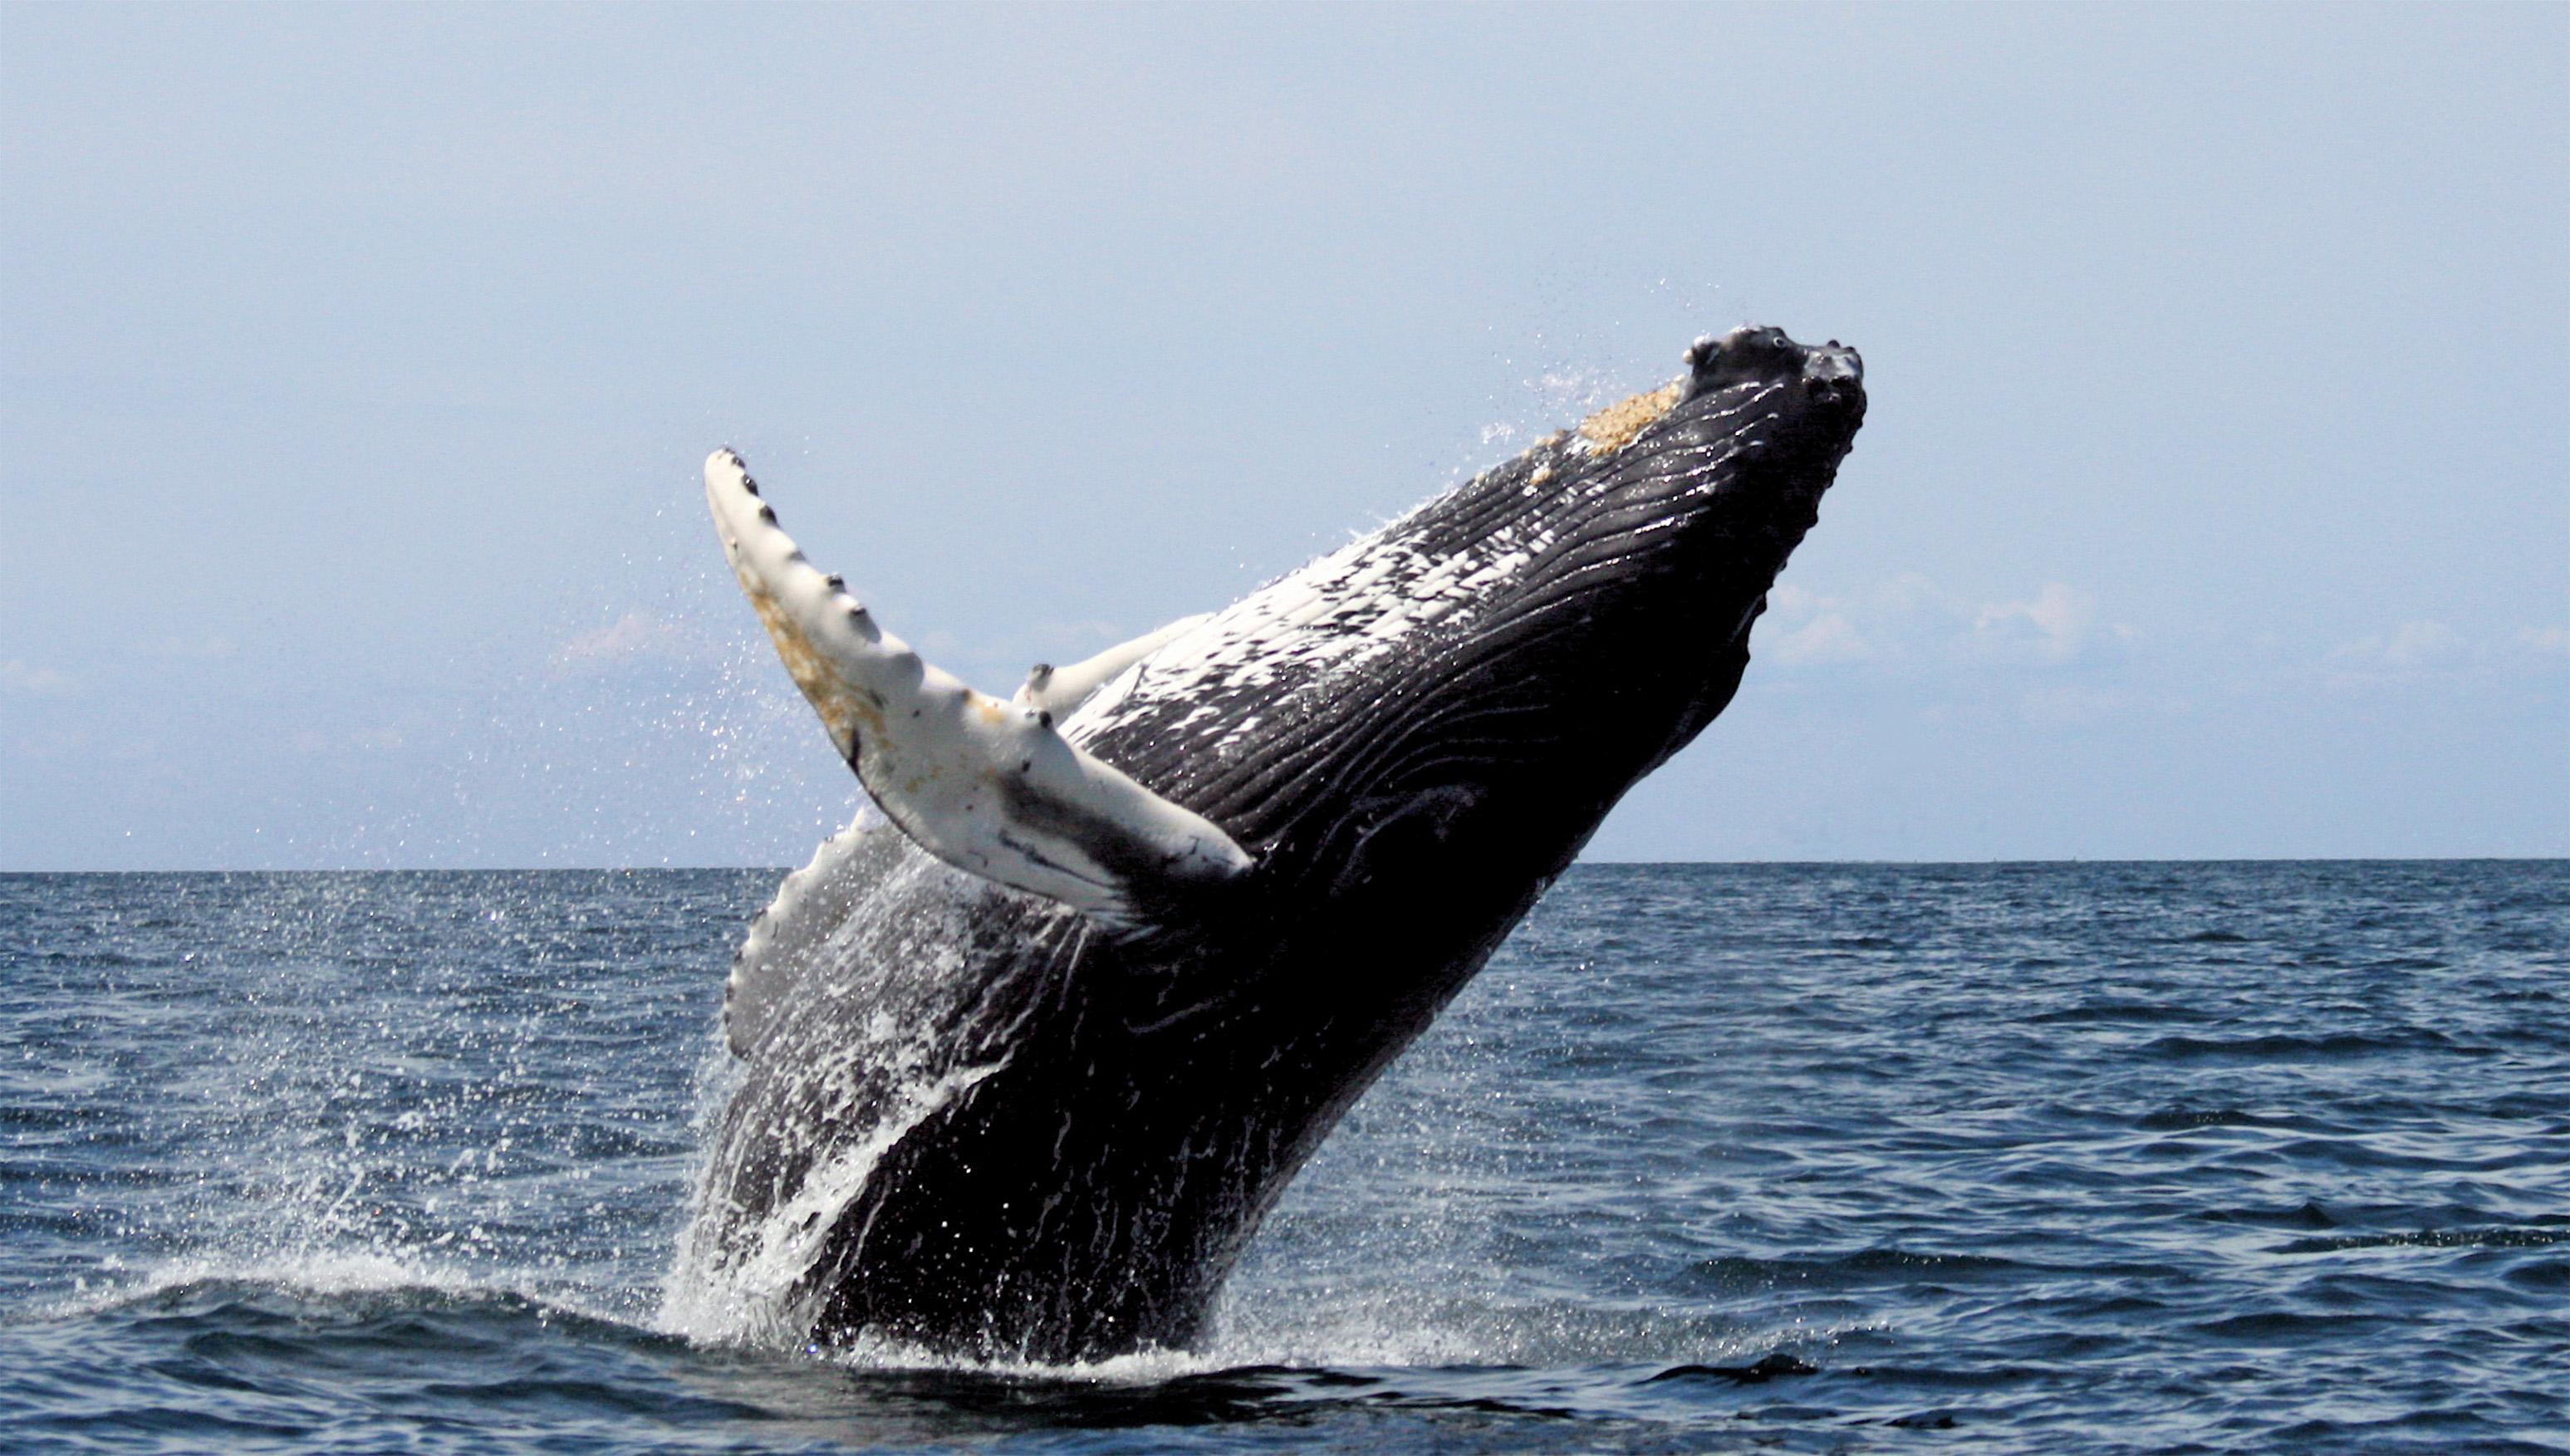 Whit Welles Wikimedia Commons Humpback Whale, breaching, Stellwagen Bank National Marine Sanctuary.jpg